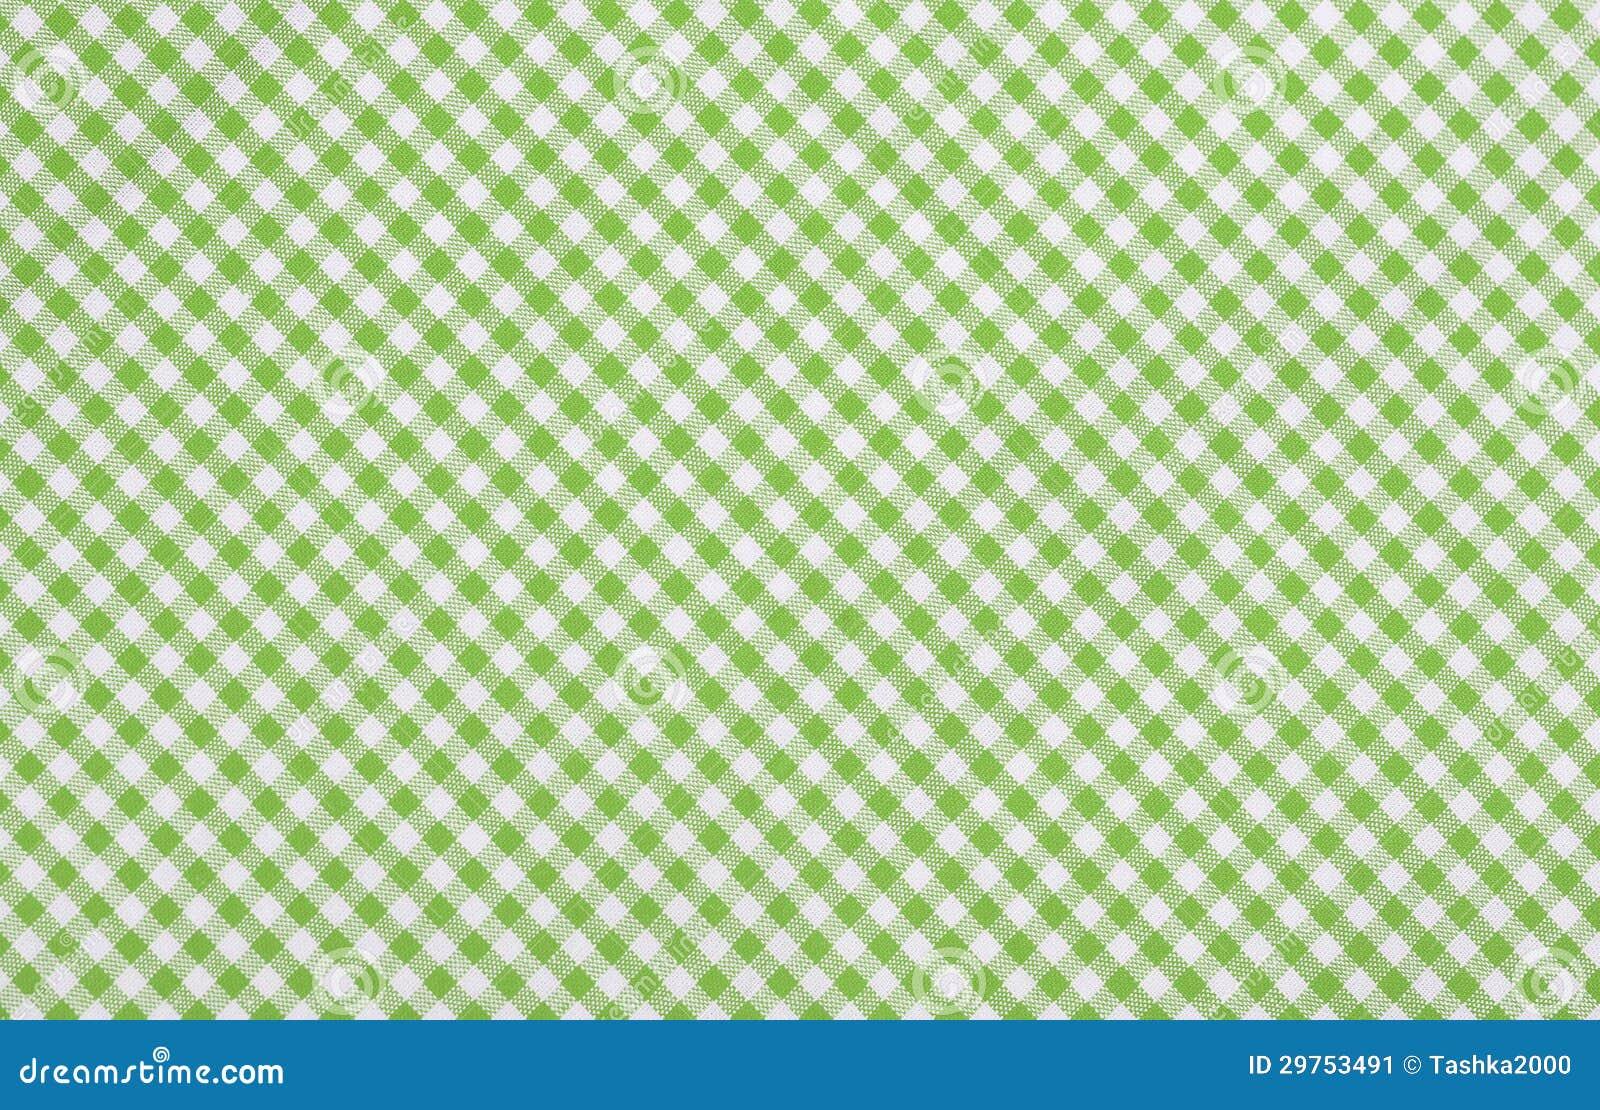 Tela checkered verde